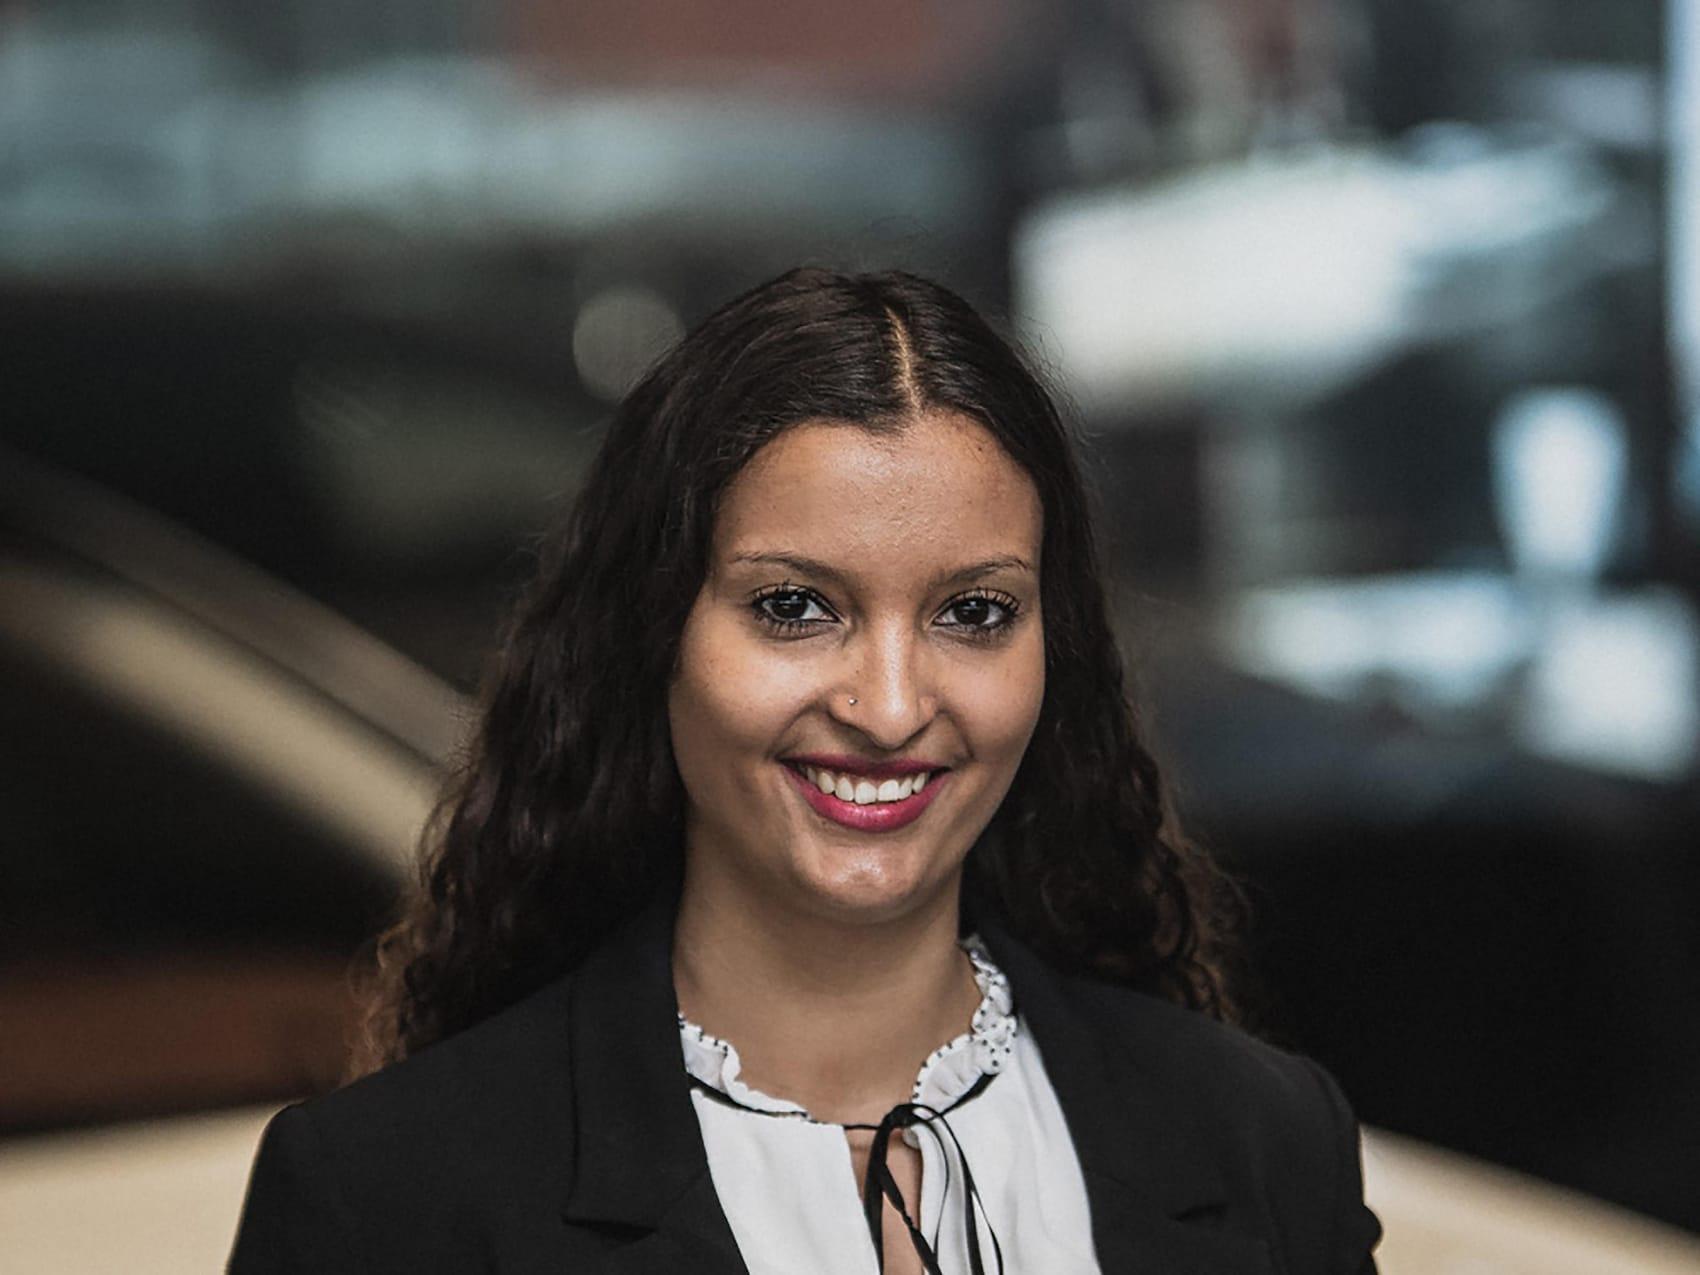 smart Center Allgäu - Mitarbeiter: Luana Chalabala